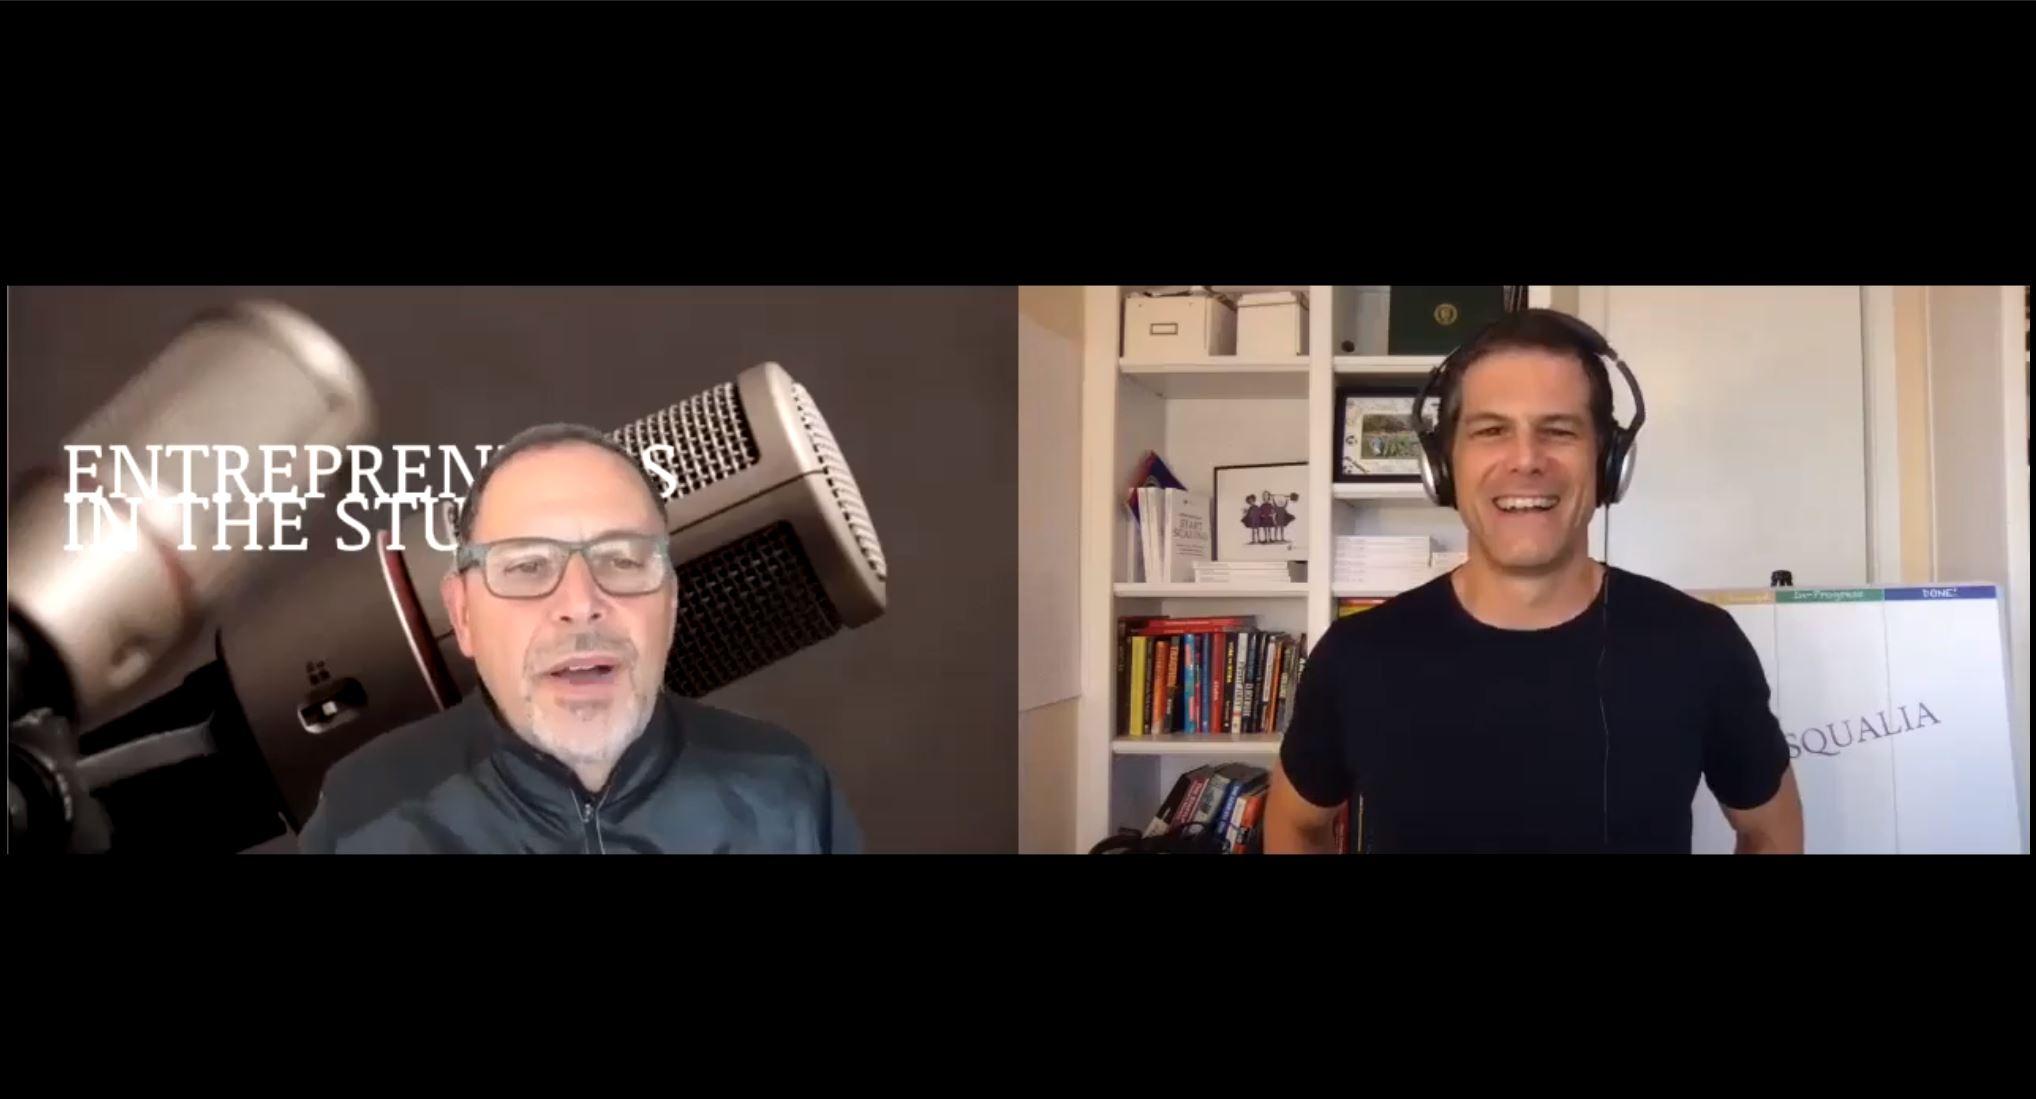 """Enterprise Selling Strategies In A Volatile Market"" with Scott Sambucci of SalesQualia"